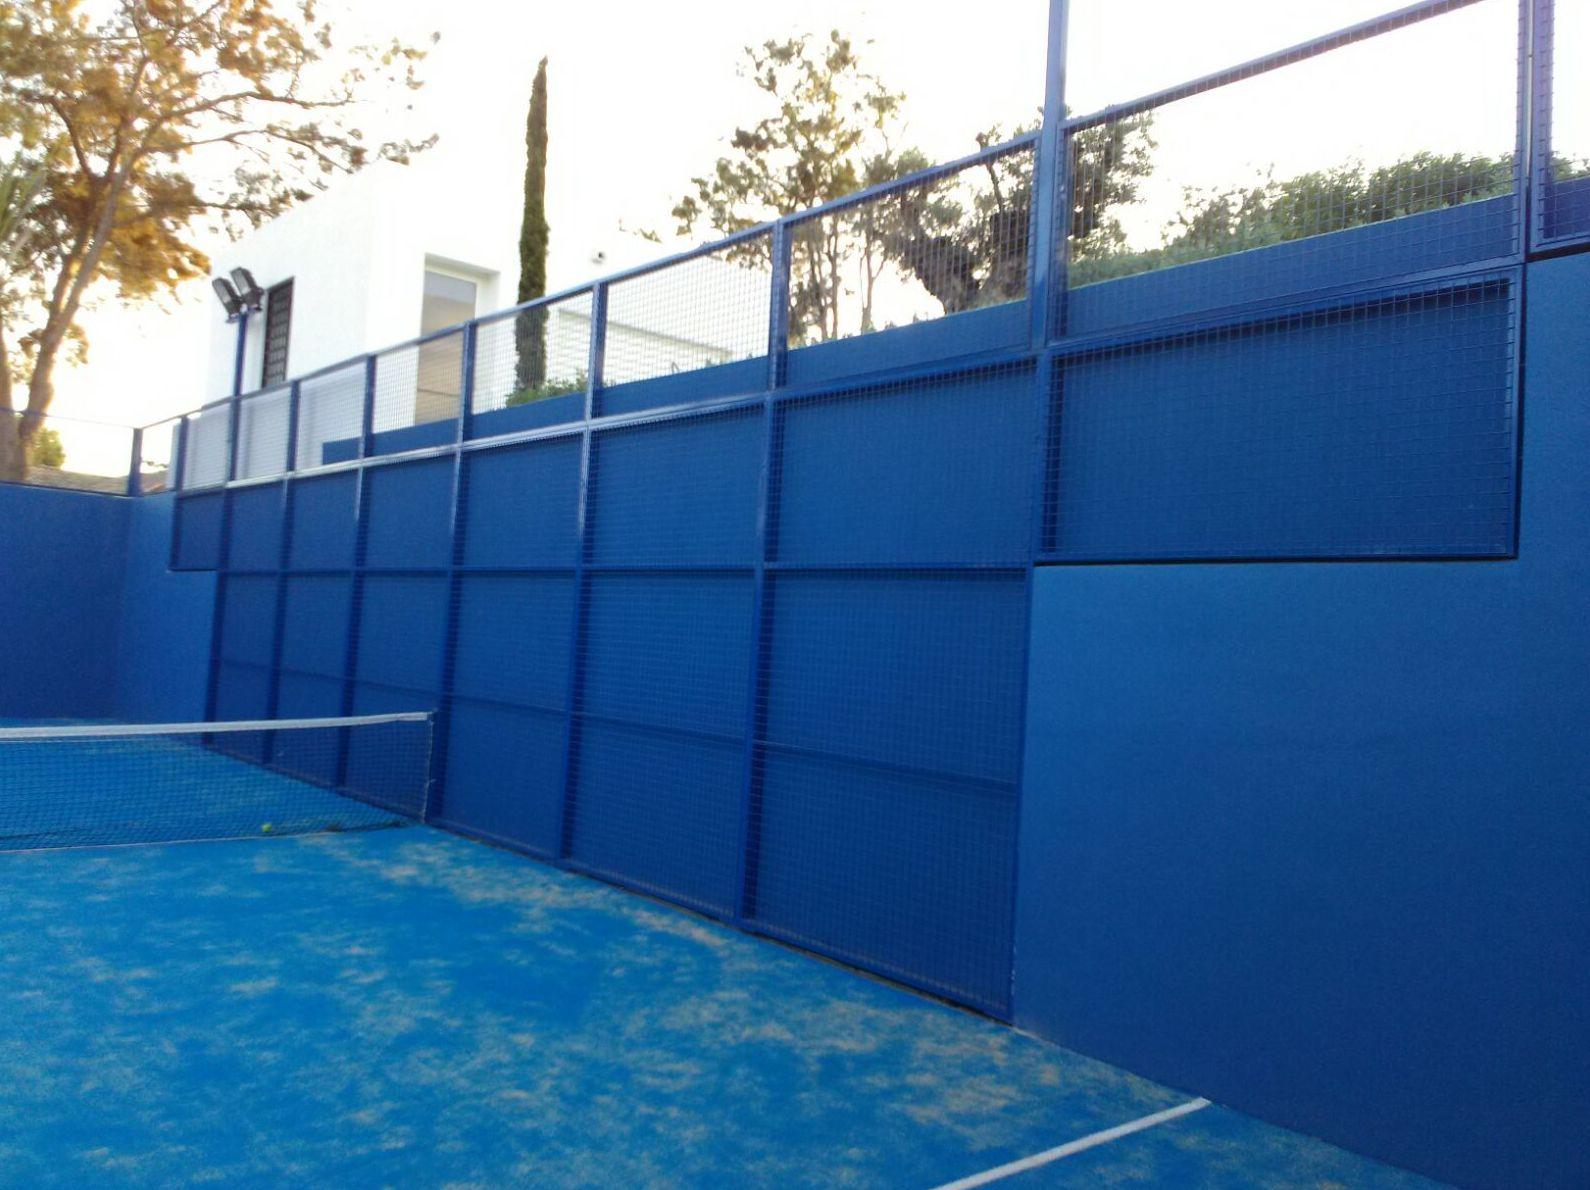 Instalaciones deportivas Utrera Sevilla